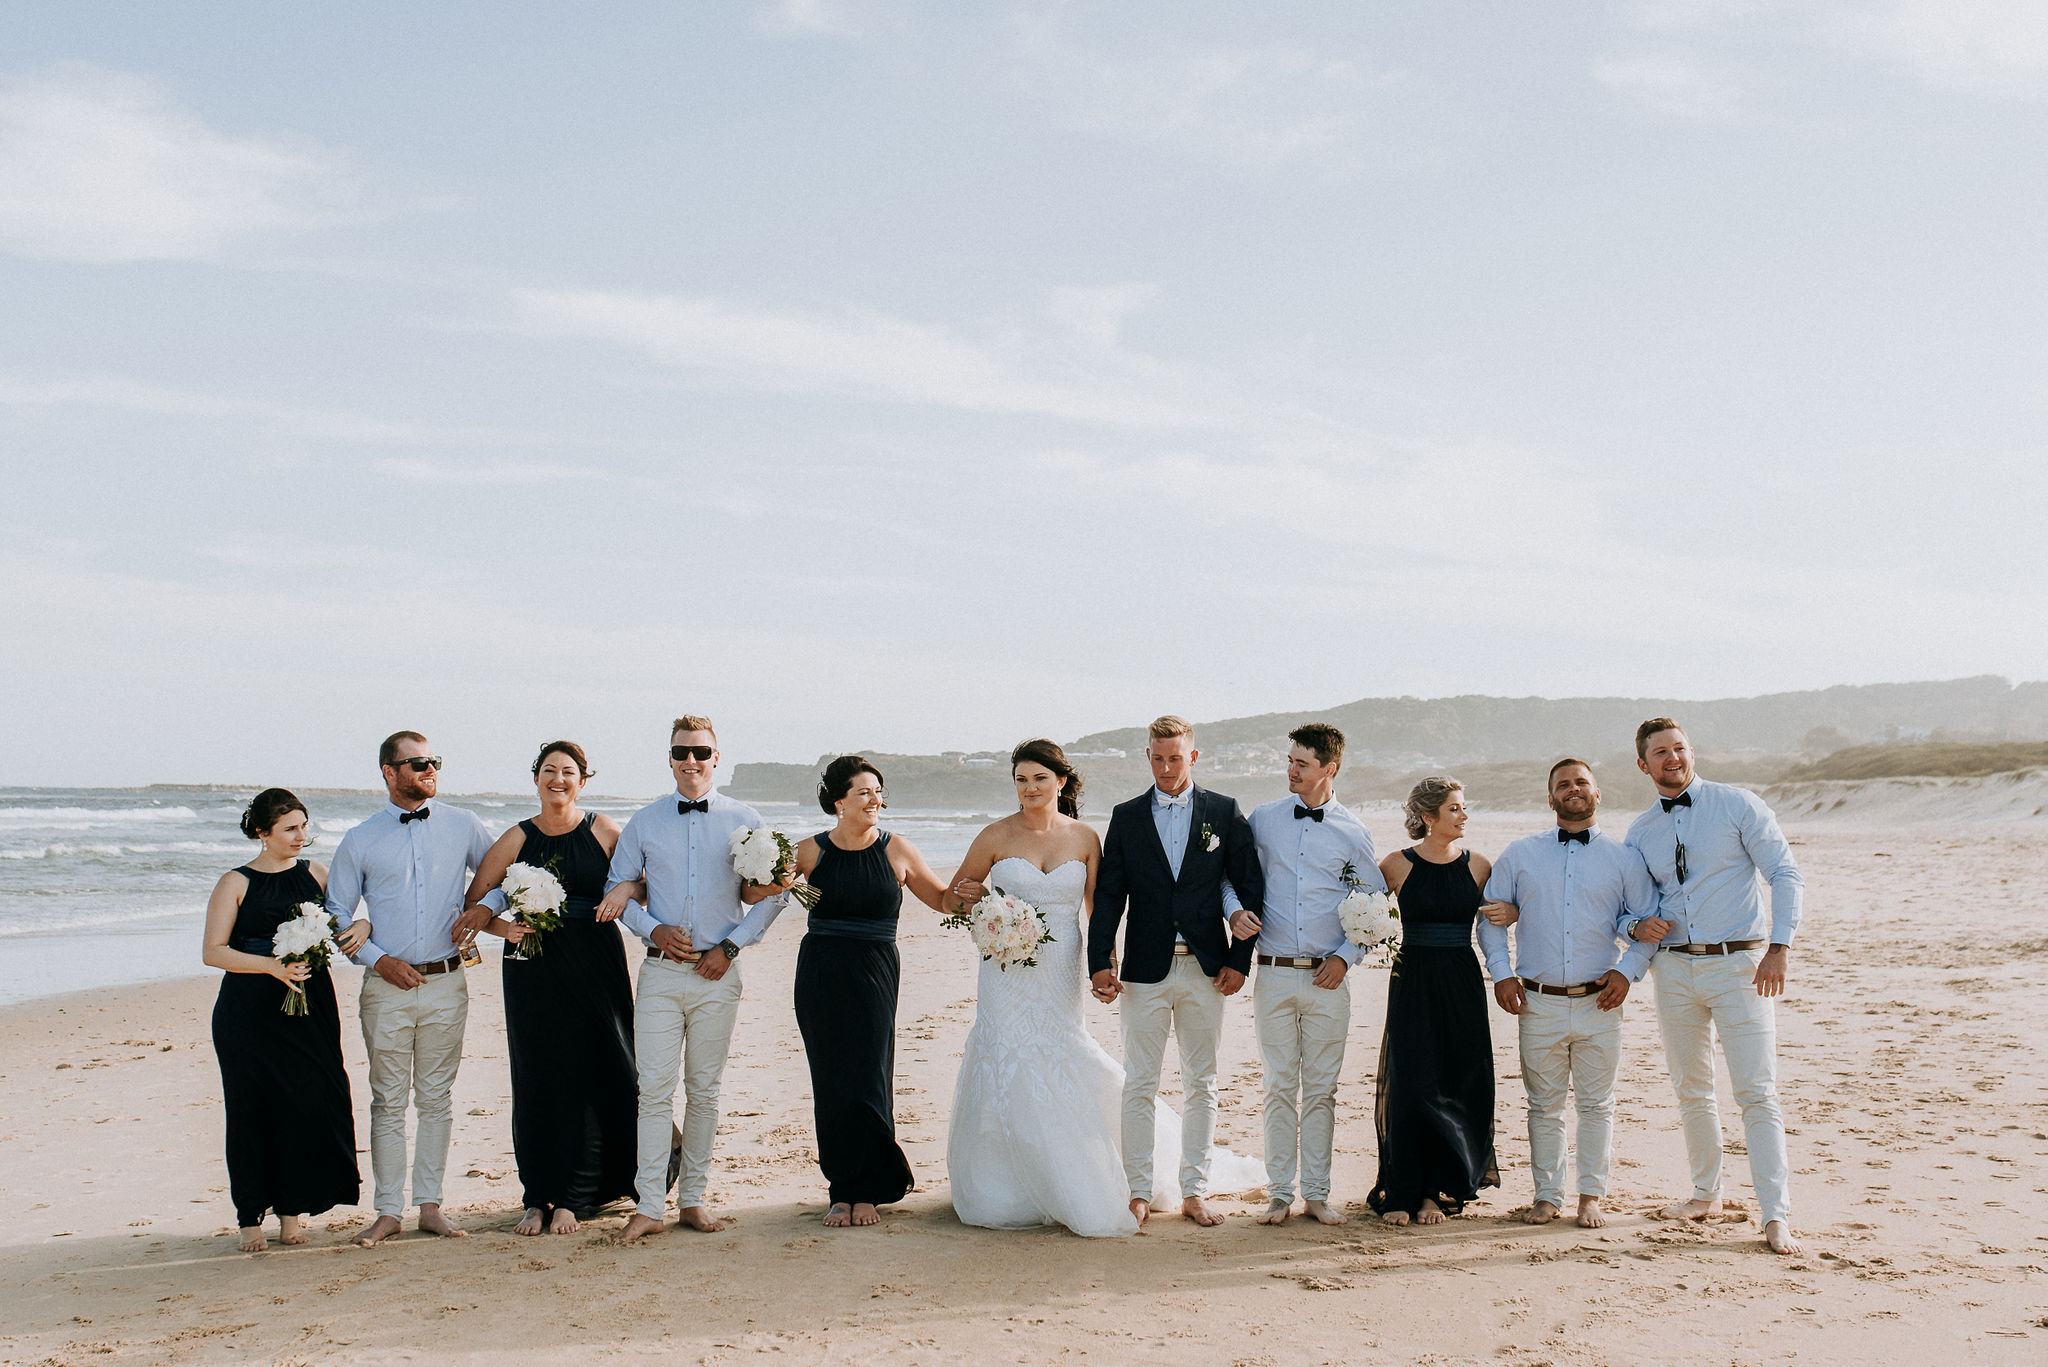 CAVES-BEACH-HOTEL-WEDDING-PATTEN-946.jpg